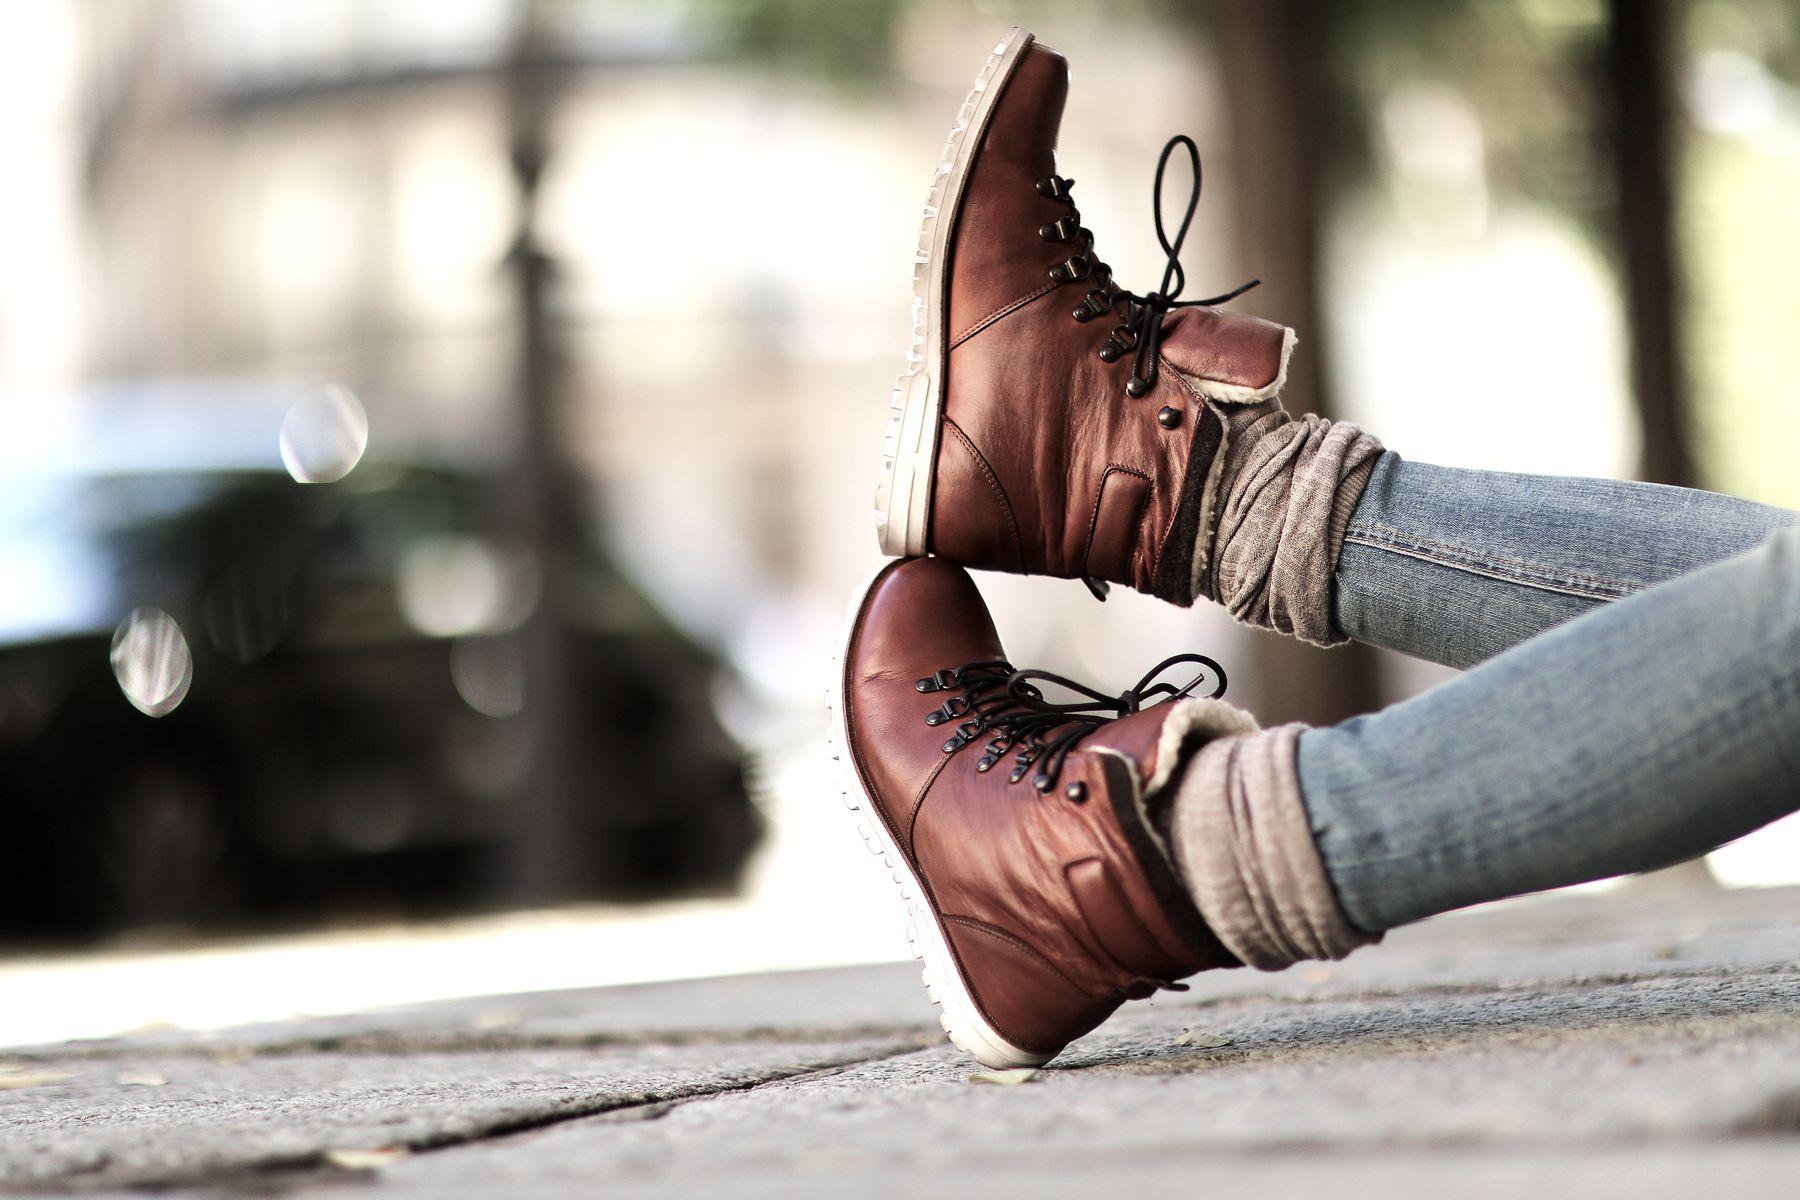 trendy-taste-look-outfit-street-style-trekking-tendencia-botas-parka-camisa-cuadros-plaid-shirt-fall-otoño-6